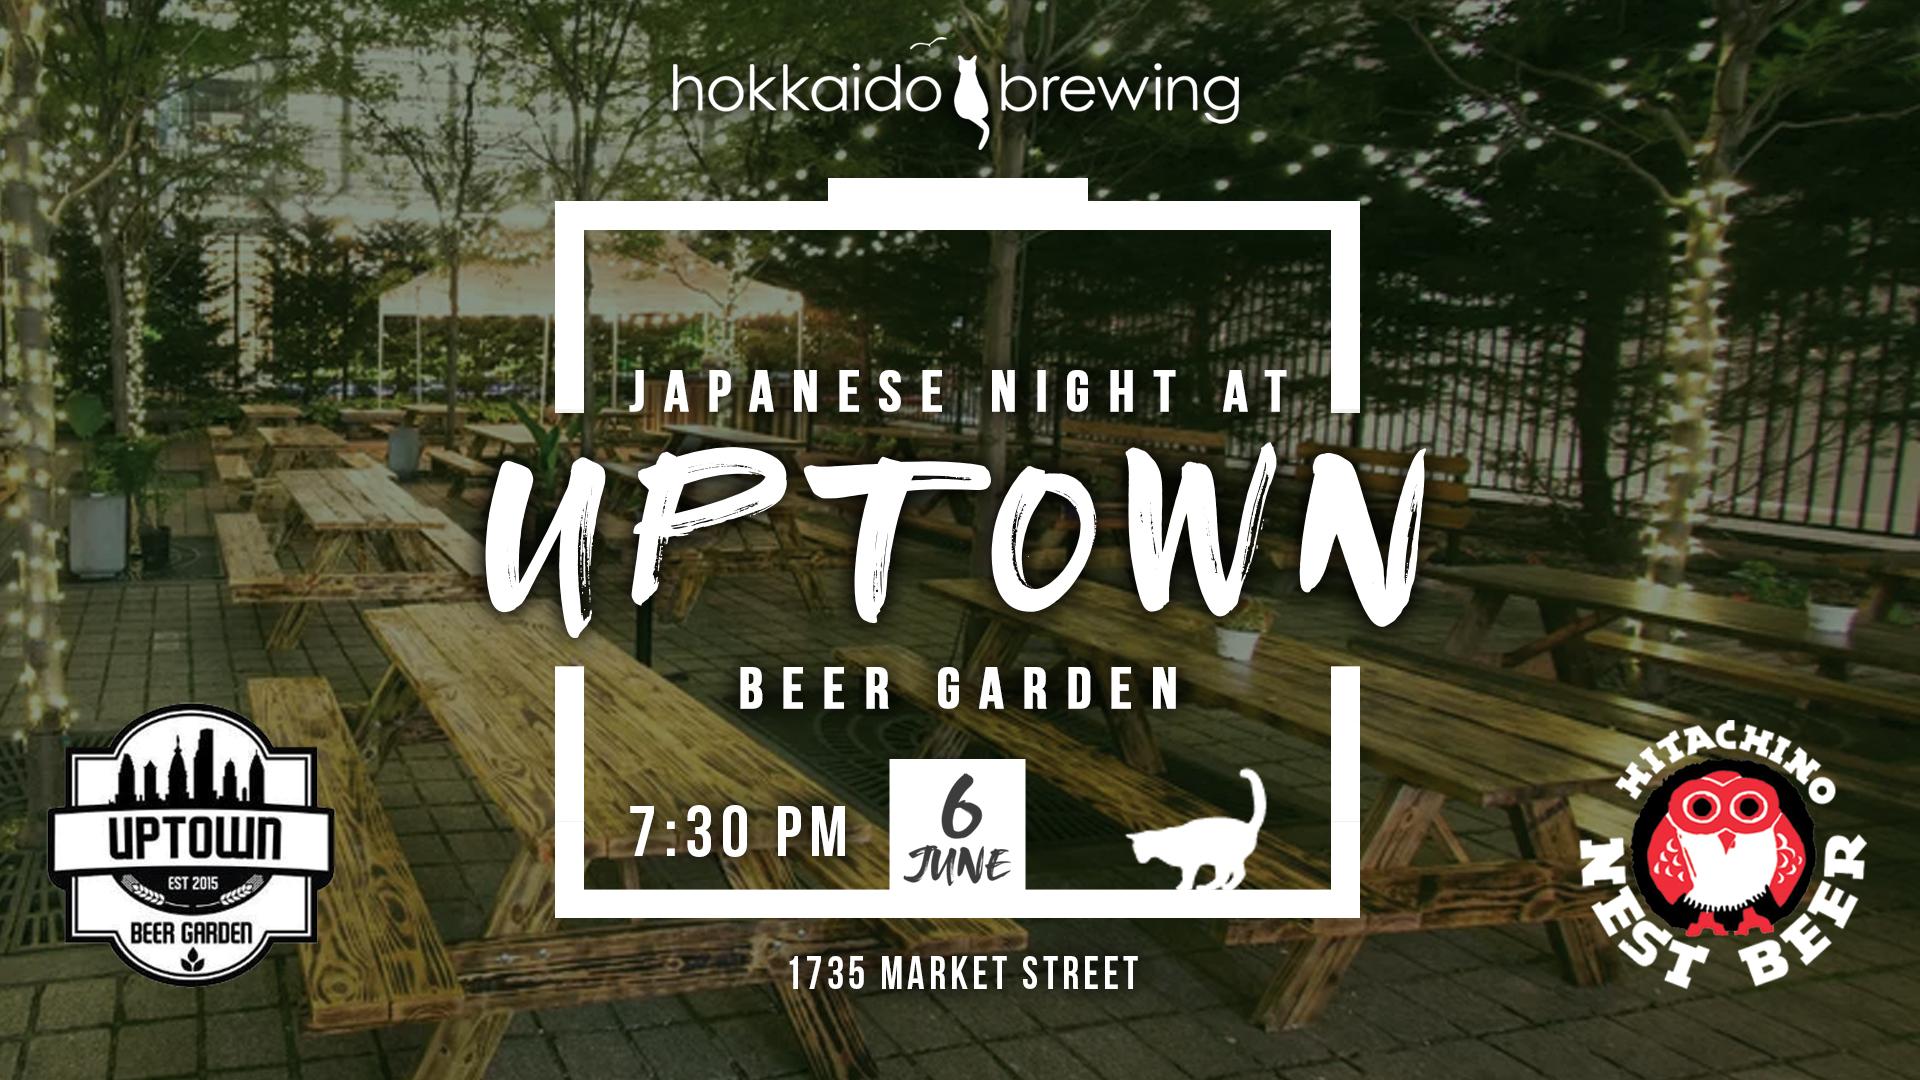 uptown-japanese-night-facebook-event.jpg